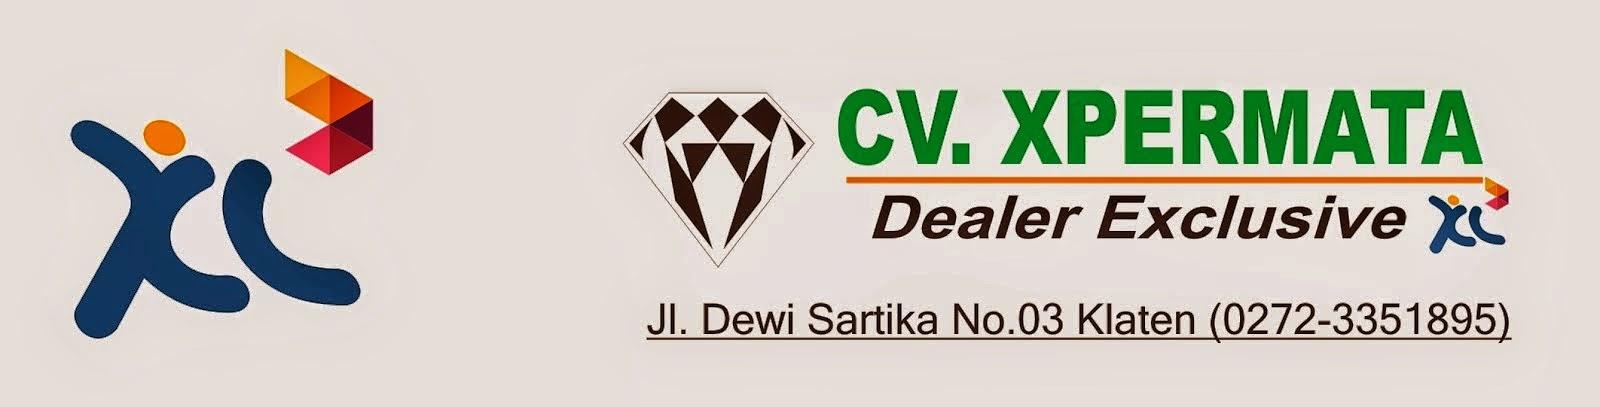 infolokersoloraya.blogspot.com Terbaru April 2014 di CV. XPermata Dealer Exclusive XL - Klaten, Sukoharjo & Wonogiri